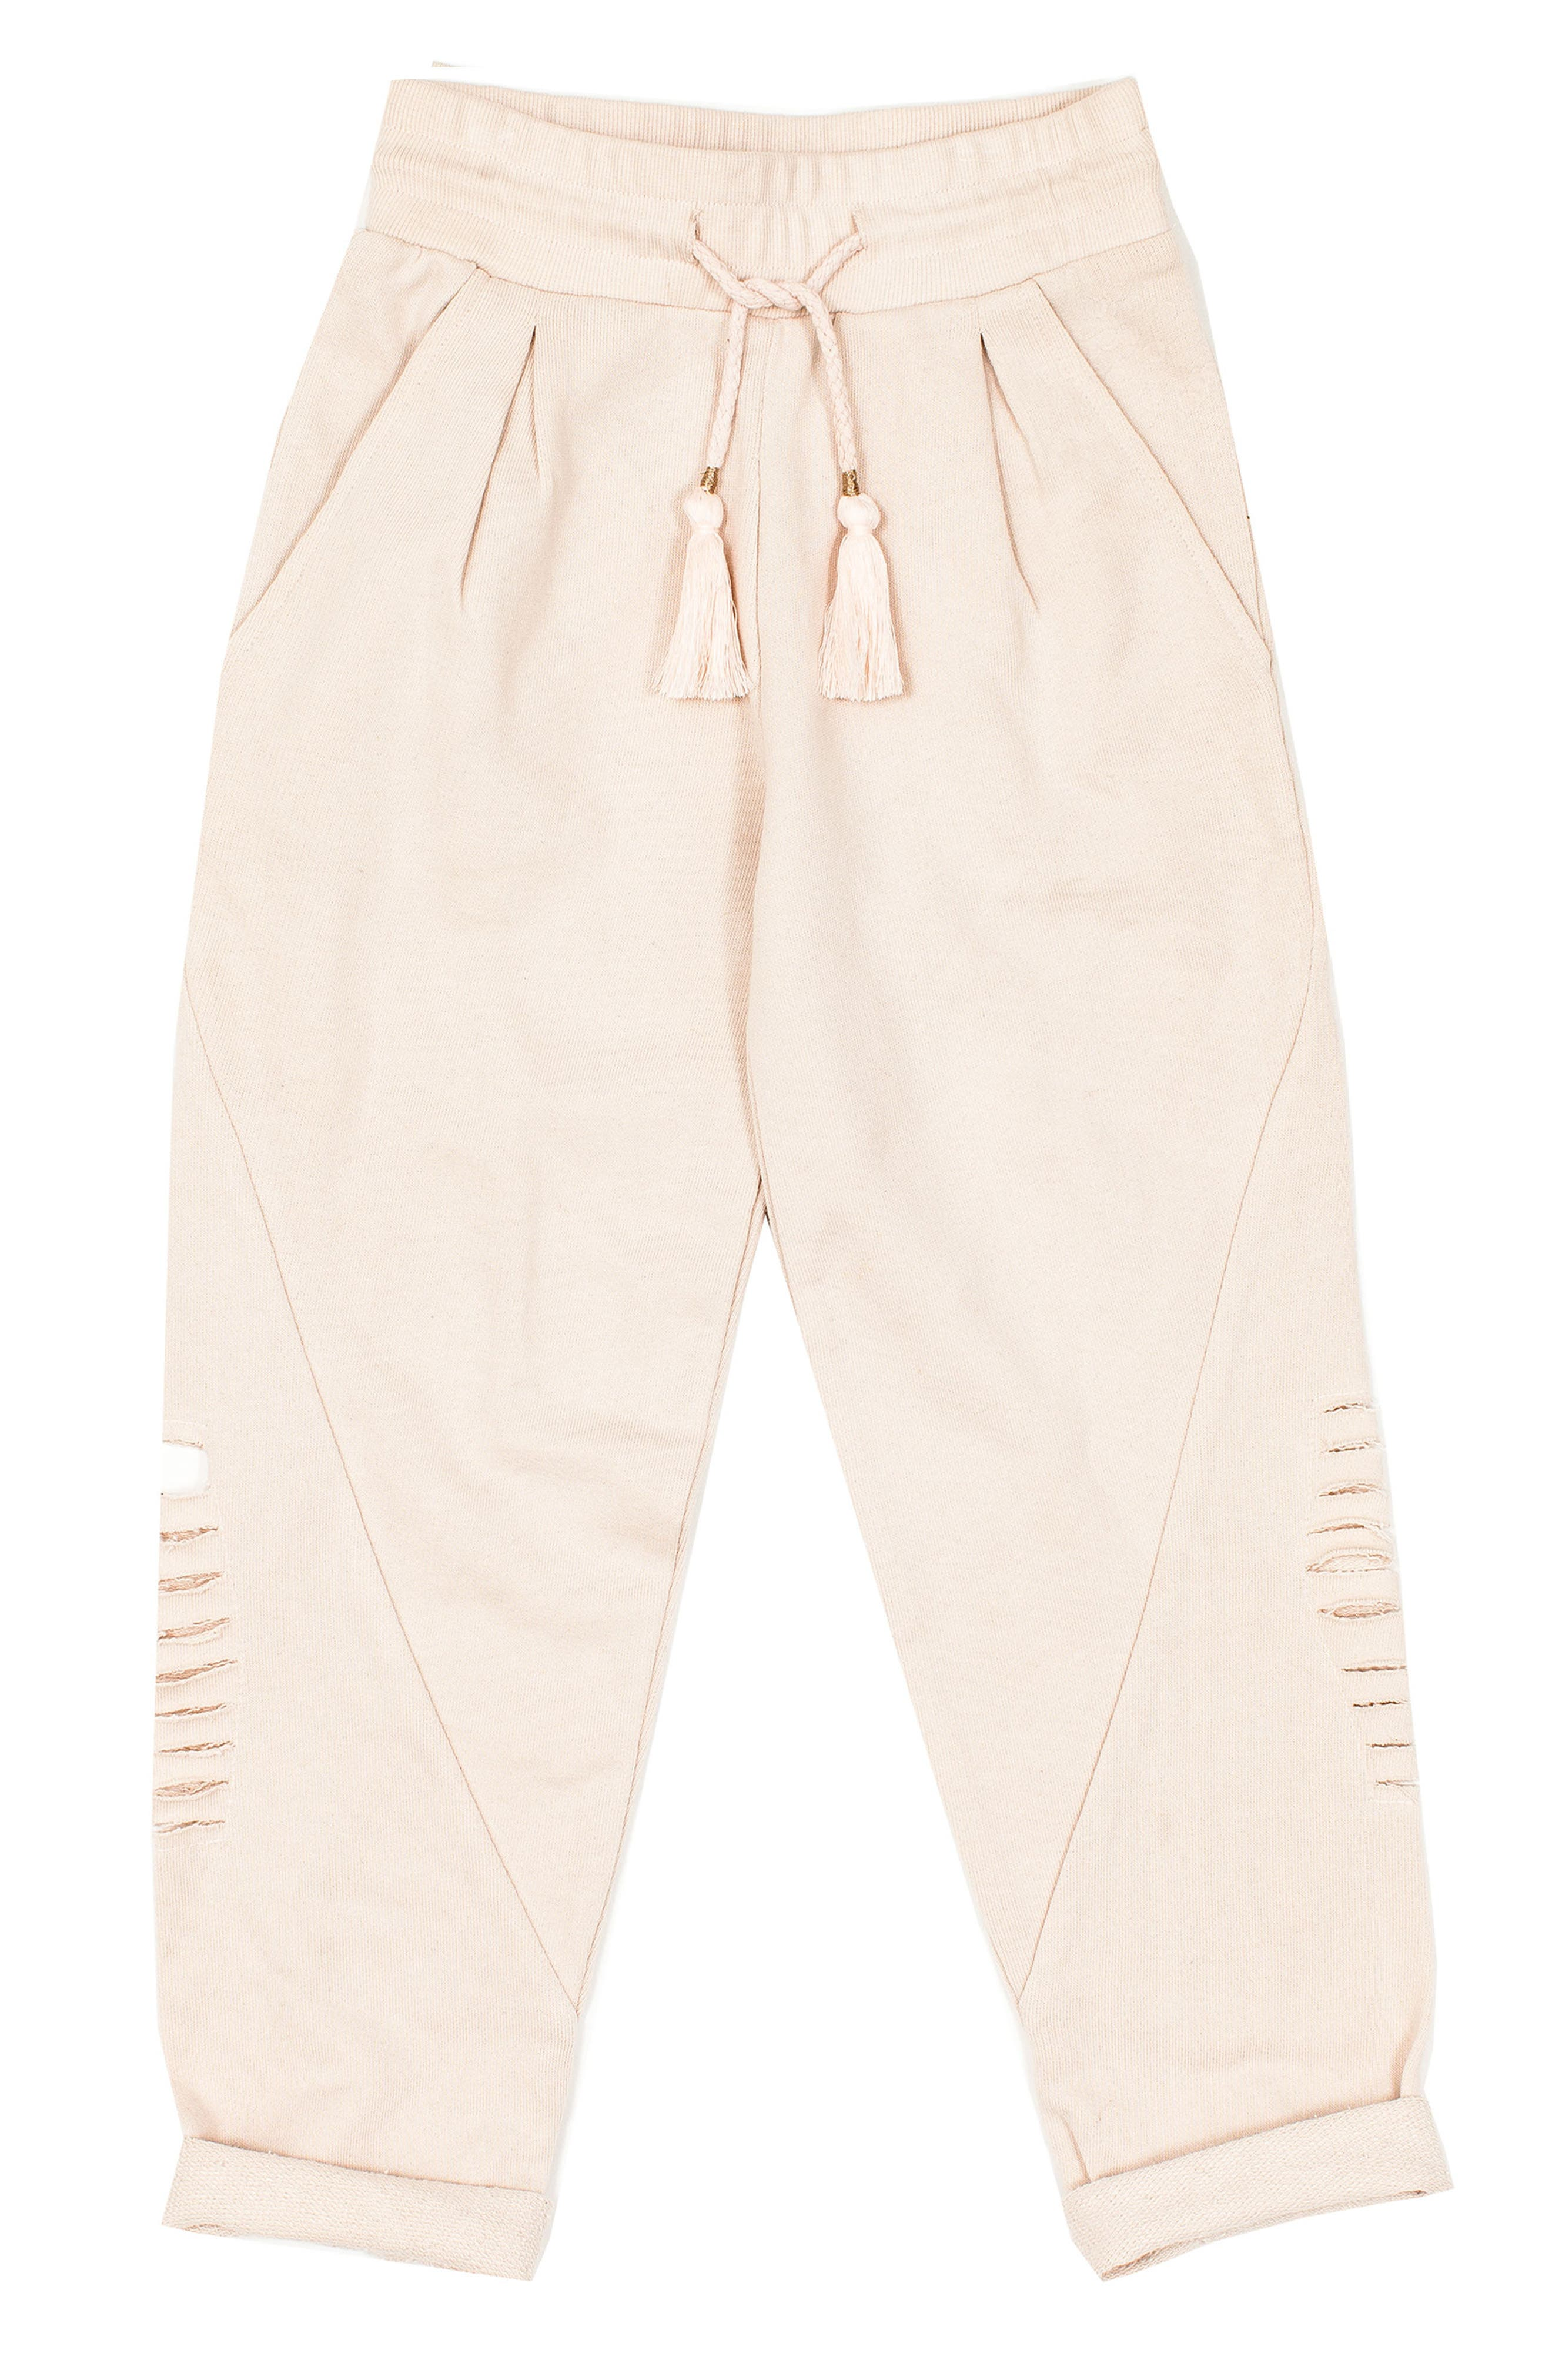 BOWIE X JAMES Alchemy Distressed Sweatpants (Toddler Girls, Little Girls & Big Girls)